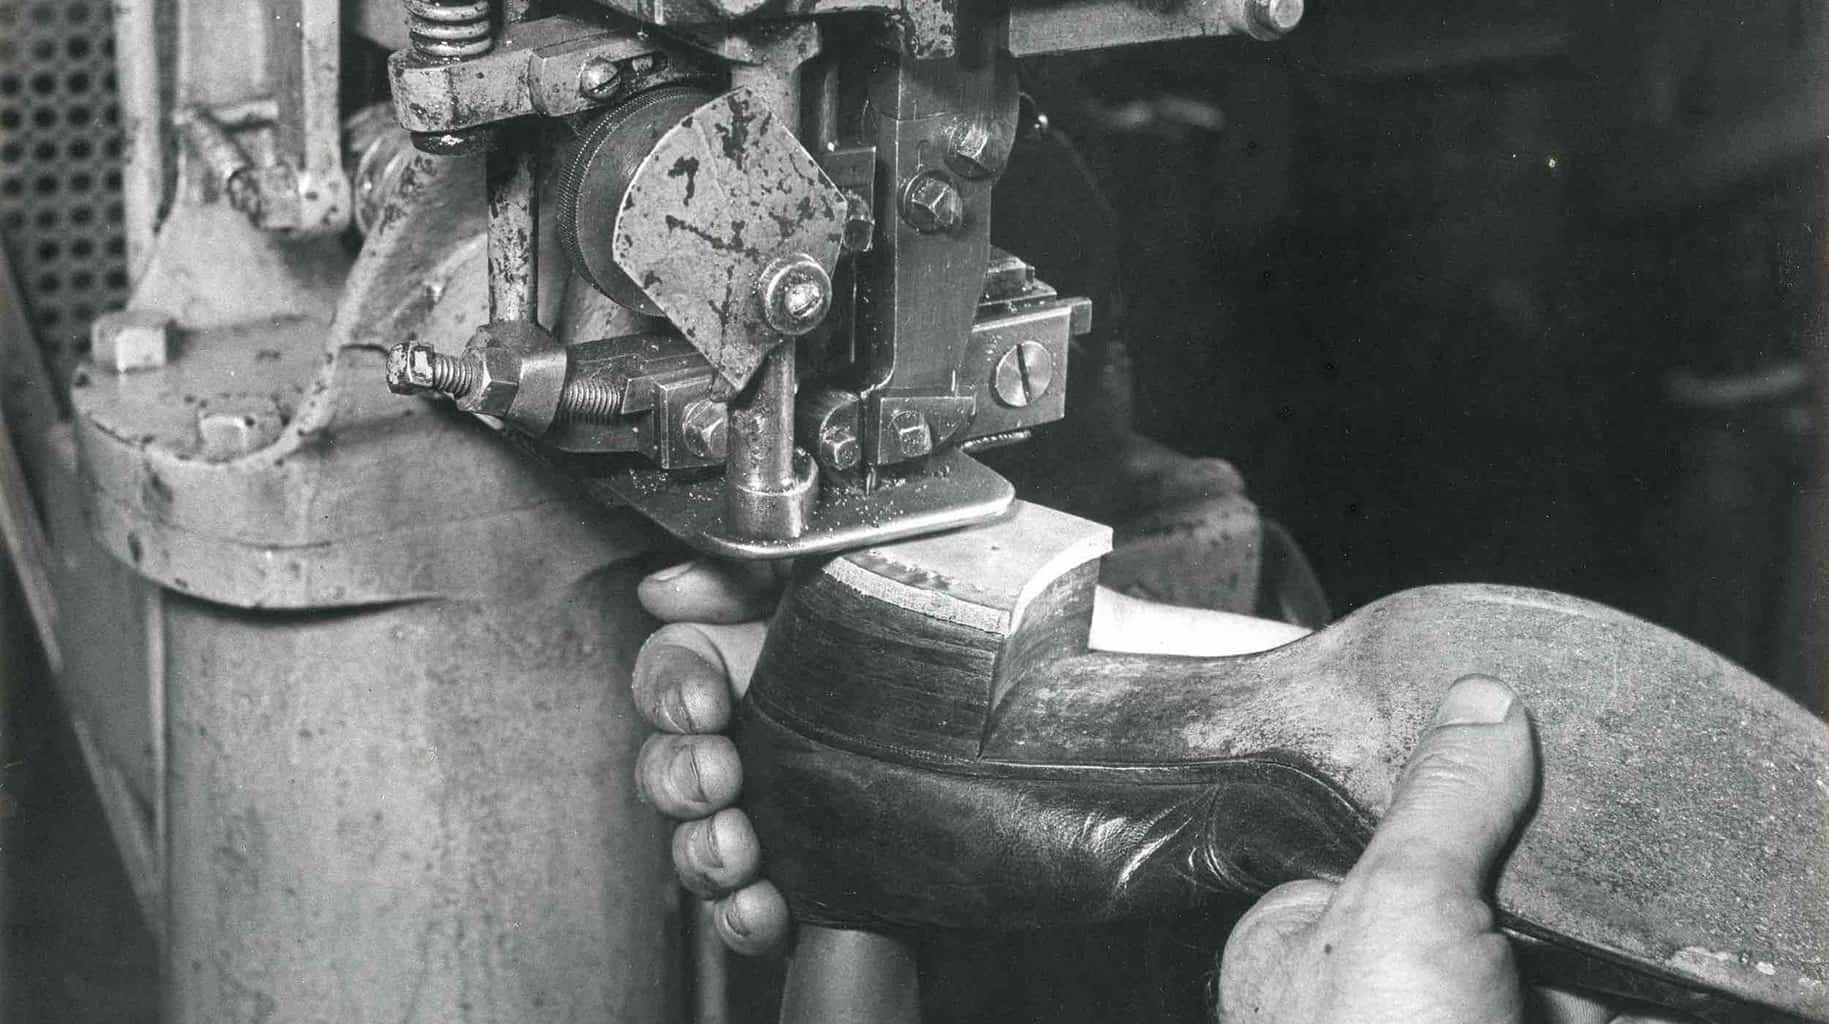 BALLY Shoes Exhibition at Museum Für Gestaltung